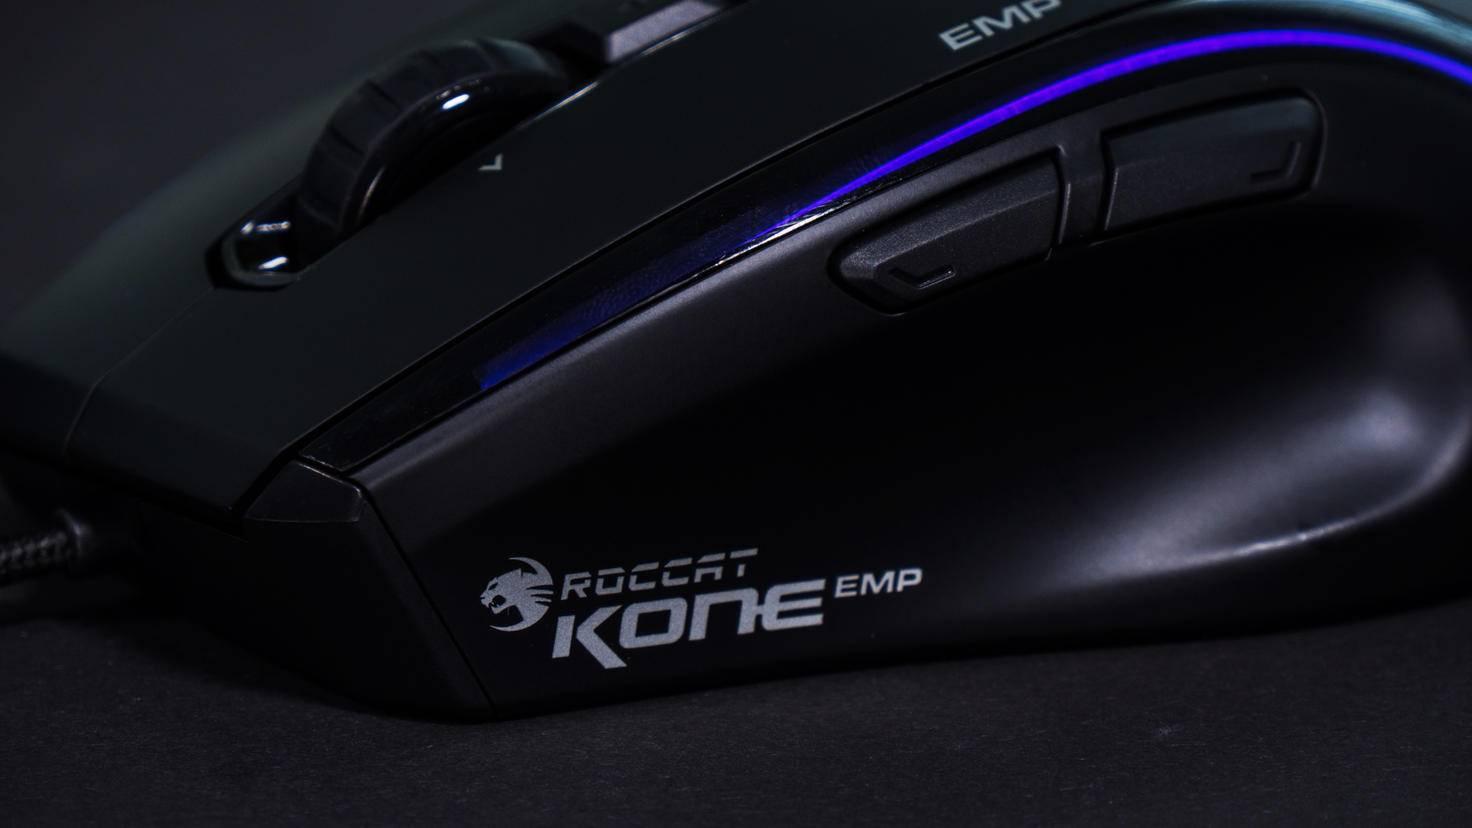 170217_Roccat_Kone_EMP-8